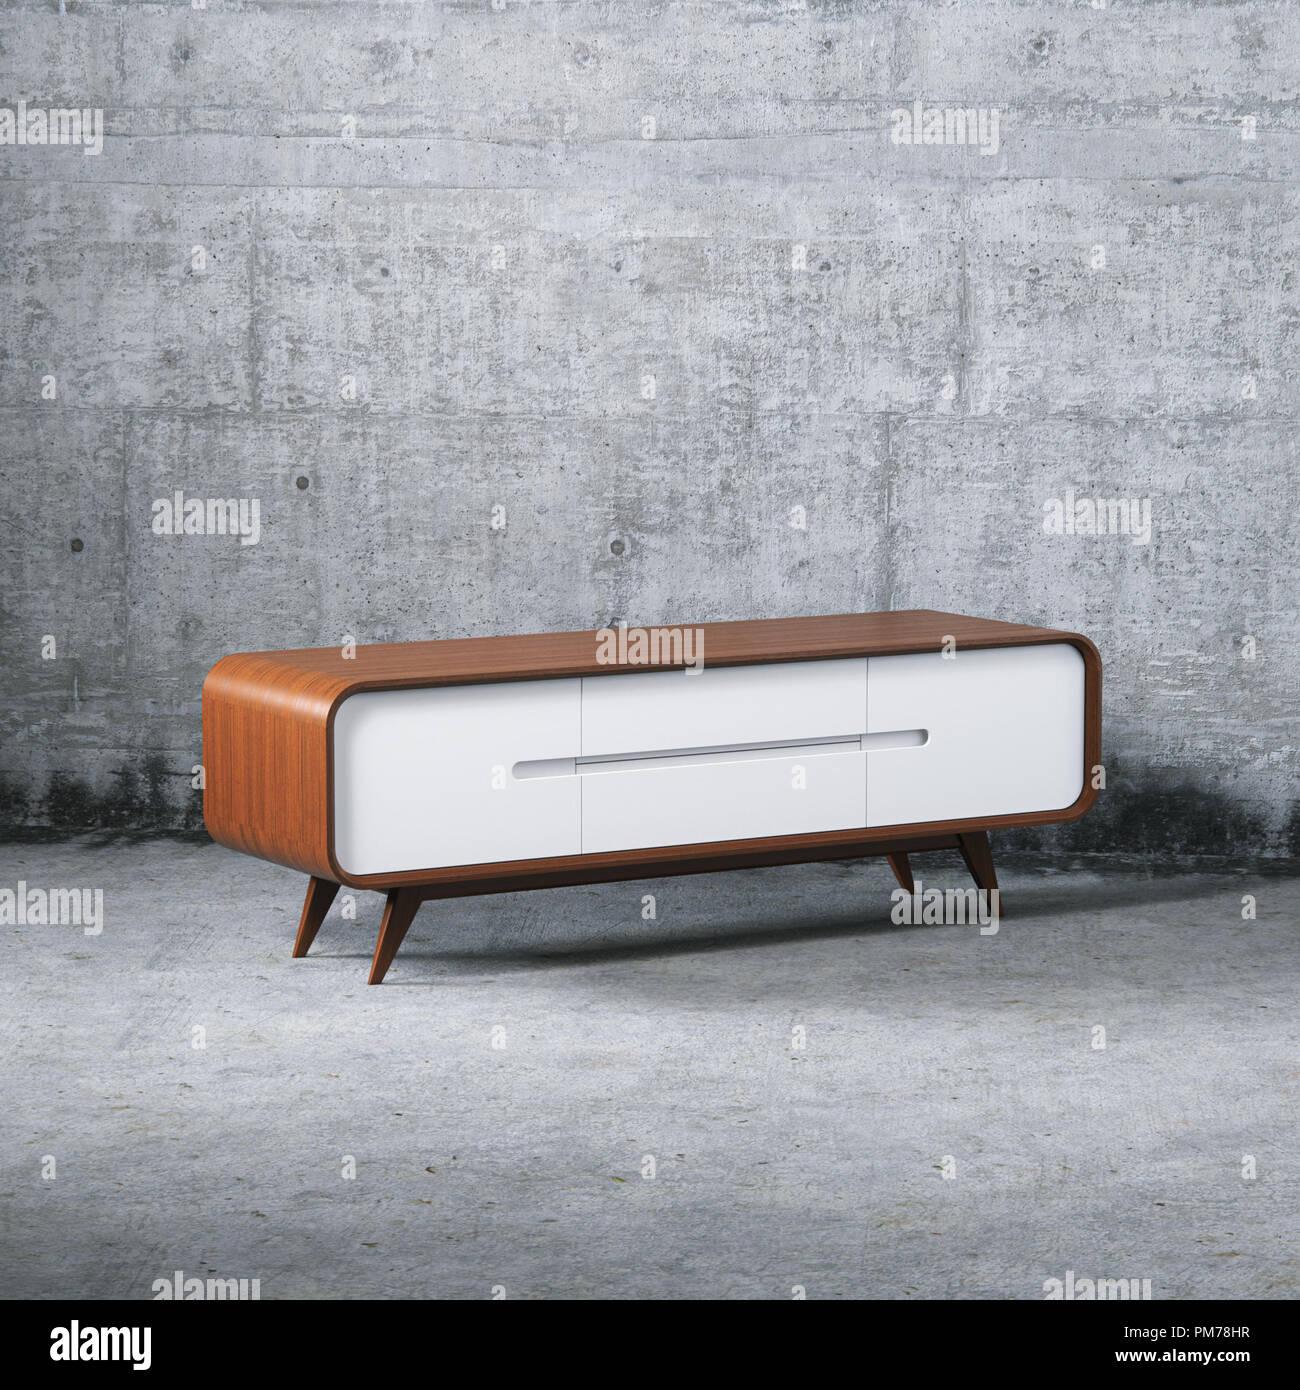 Holz- diy-Möbel vintage TV-Standfuß 3D-Rendering Stockfoto, Bild ...